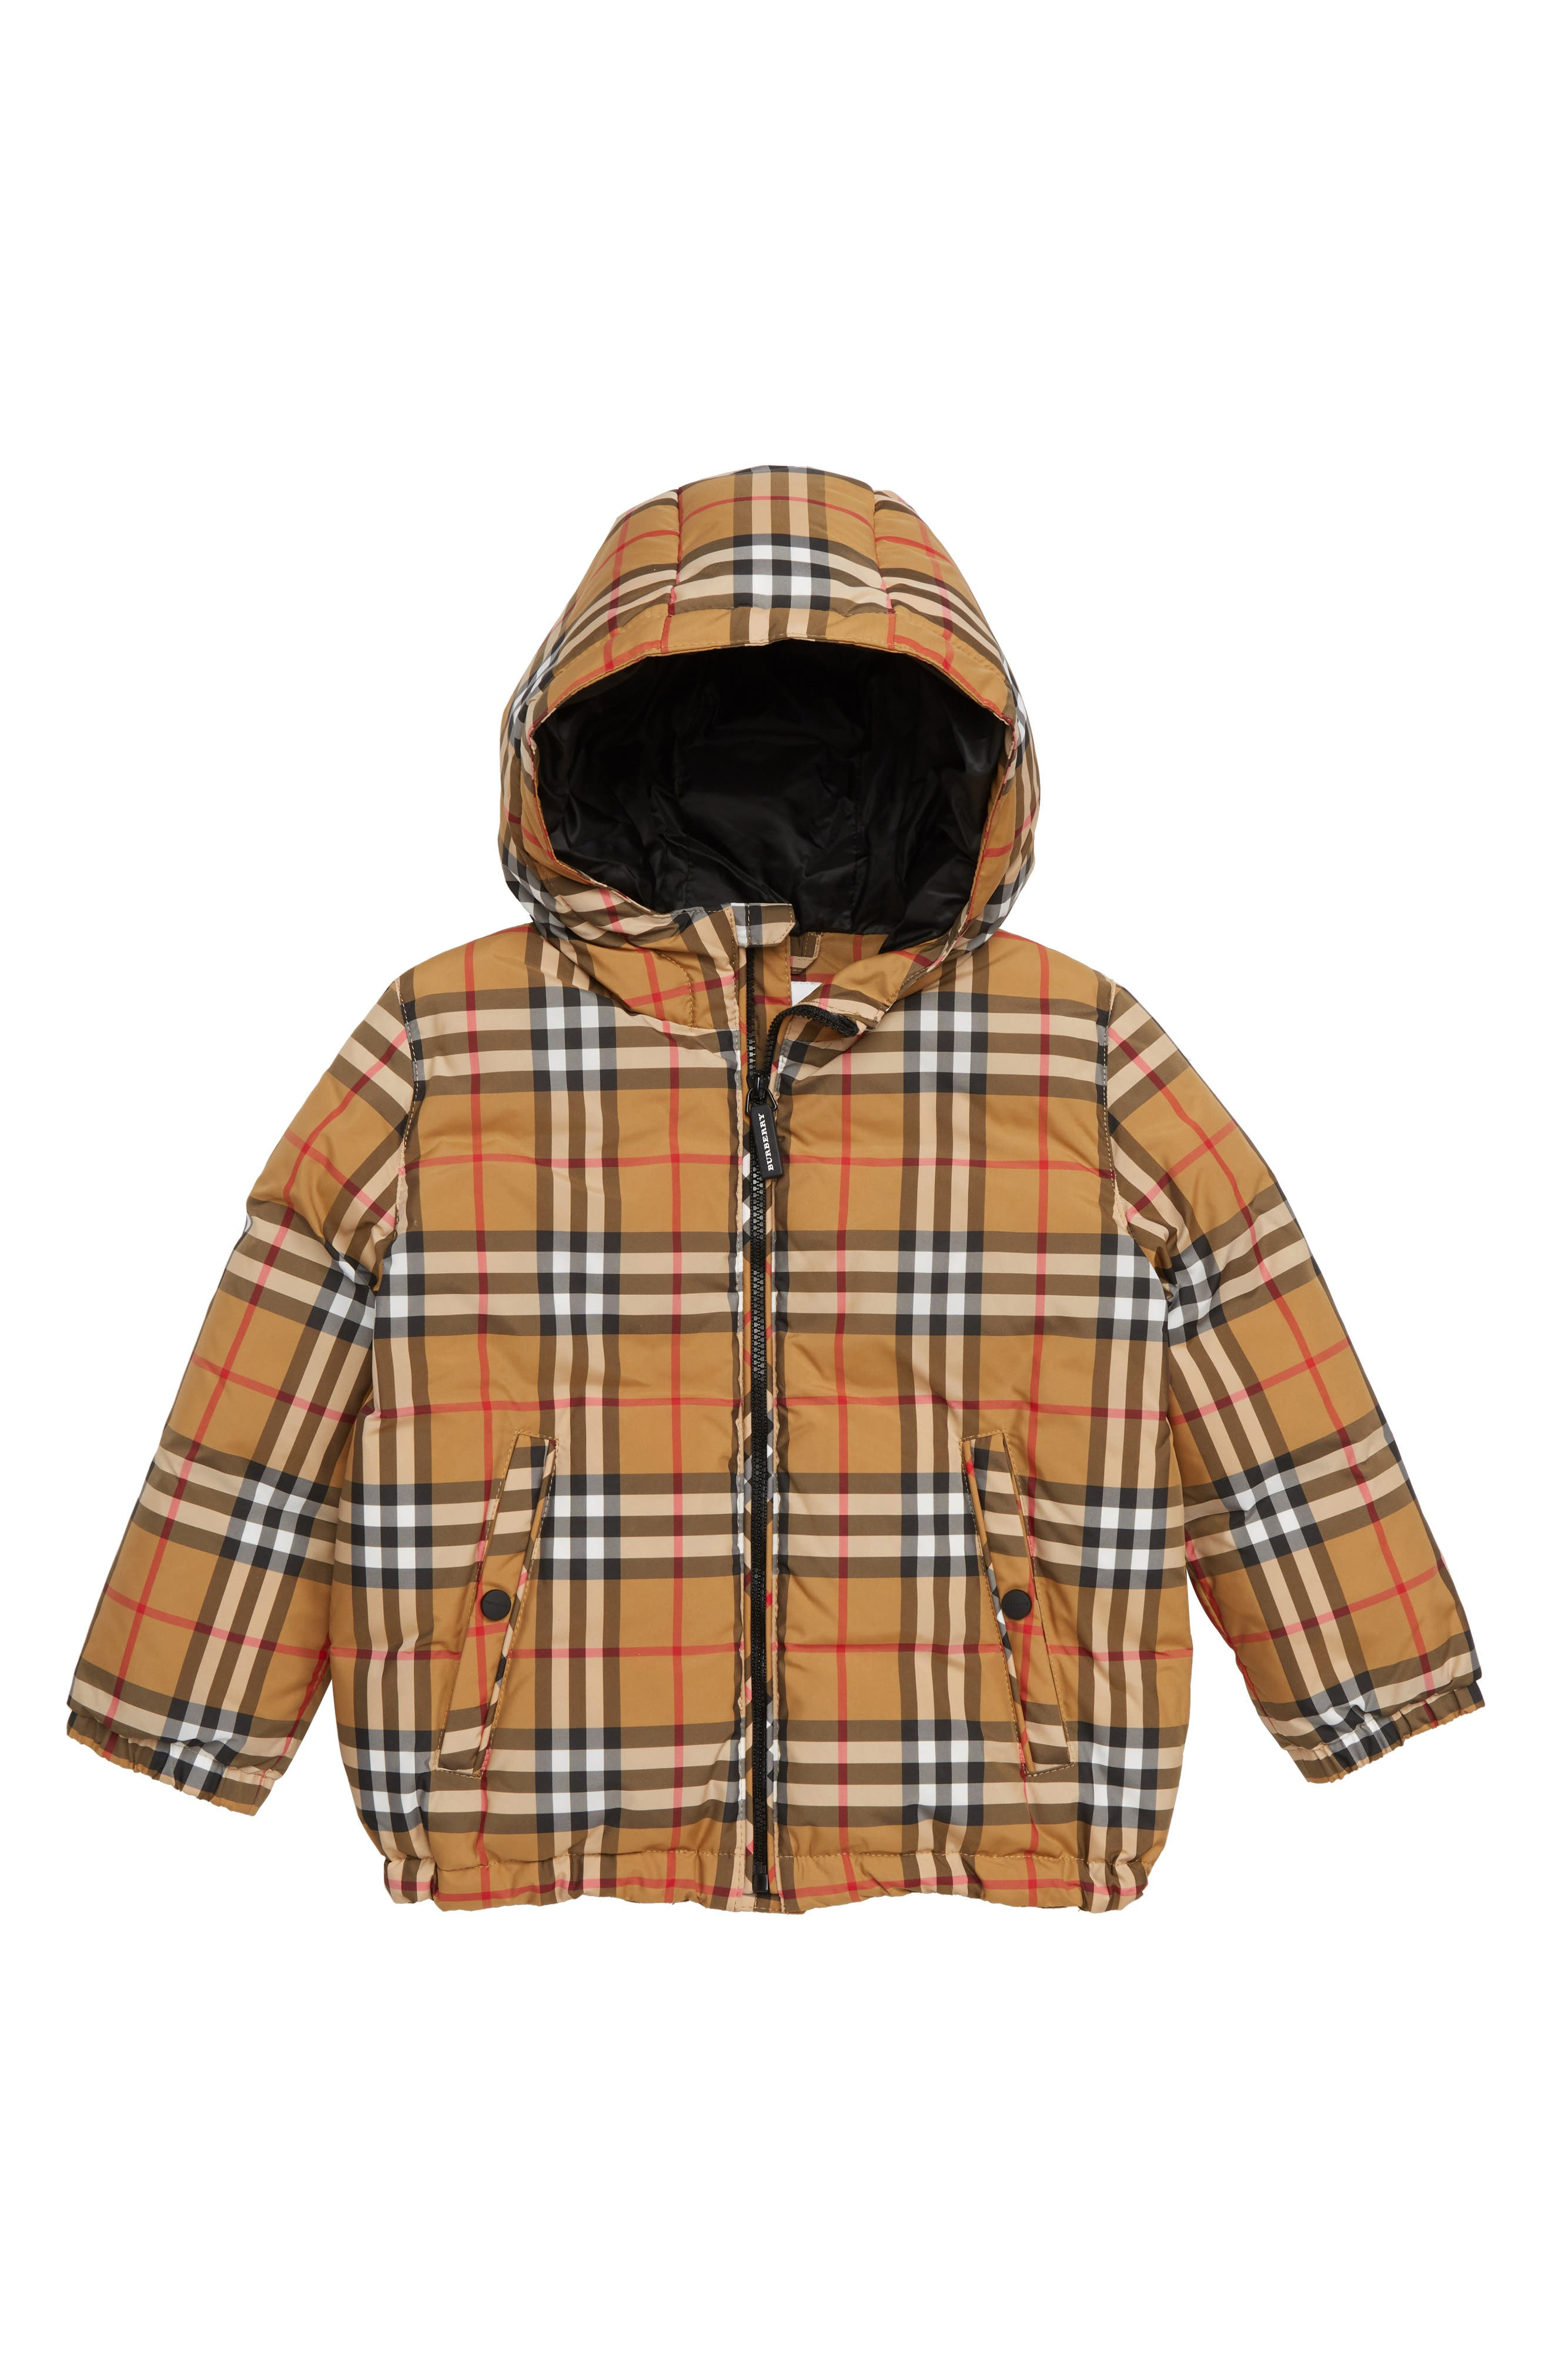 BURBERRY,                             Rio Check Hooded Jacket,                             Main thumbnail 1, color,                             701